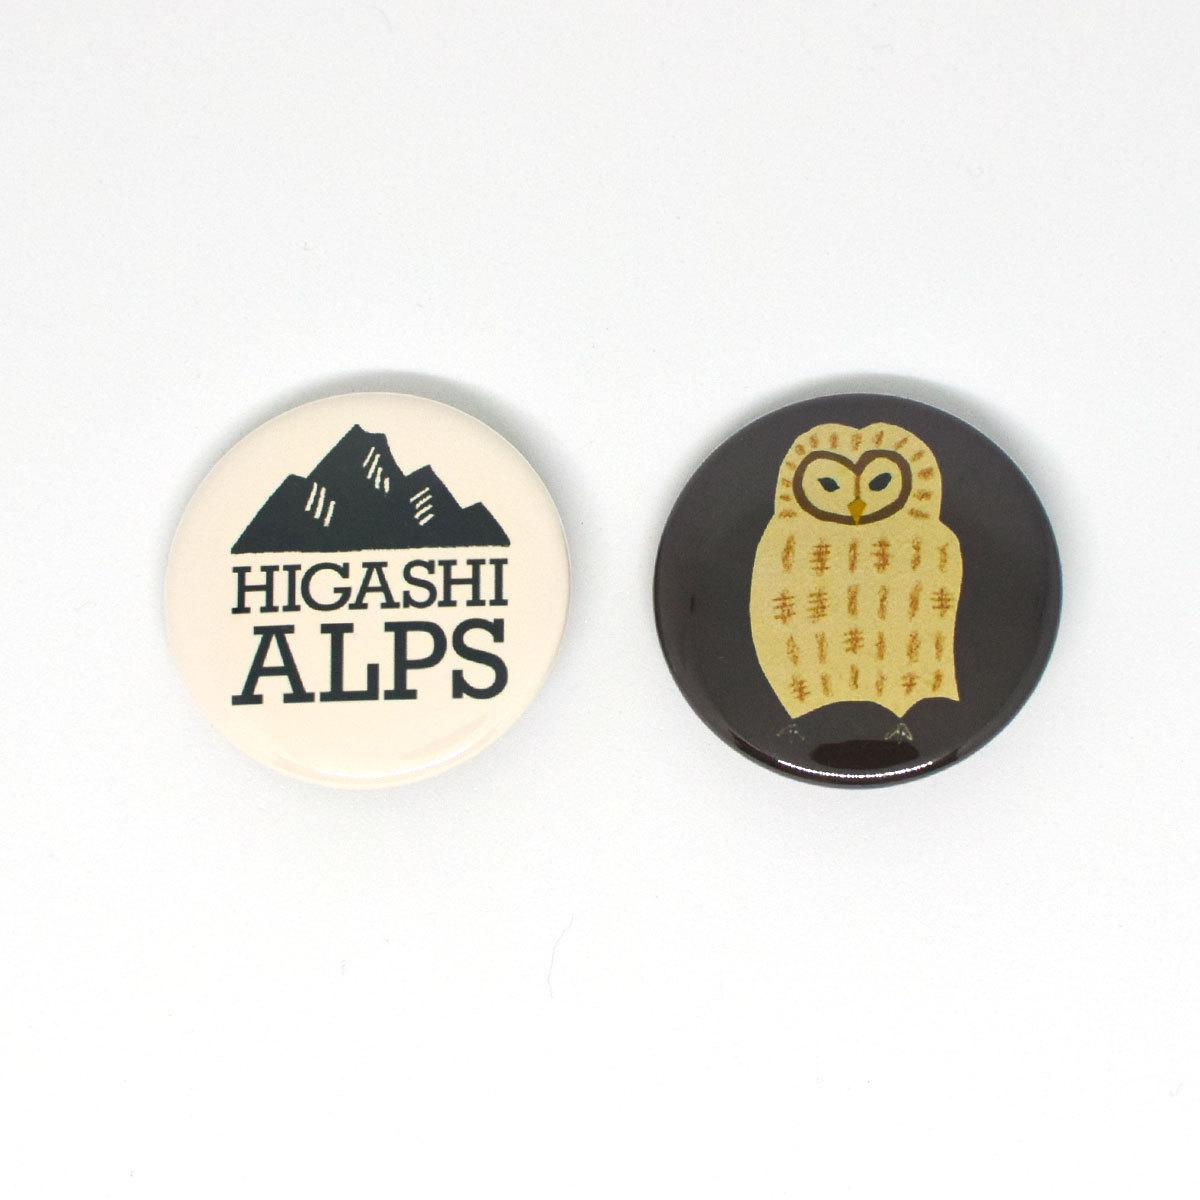 HIGASHI ALPS(ヒガシアルプス)バッヂ